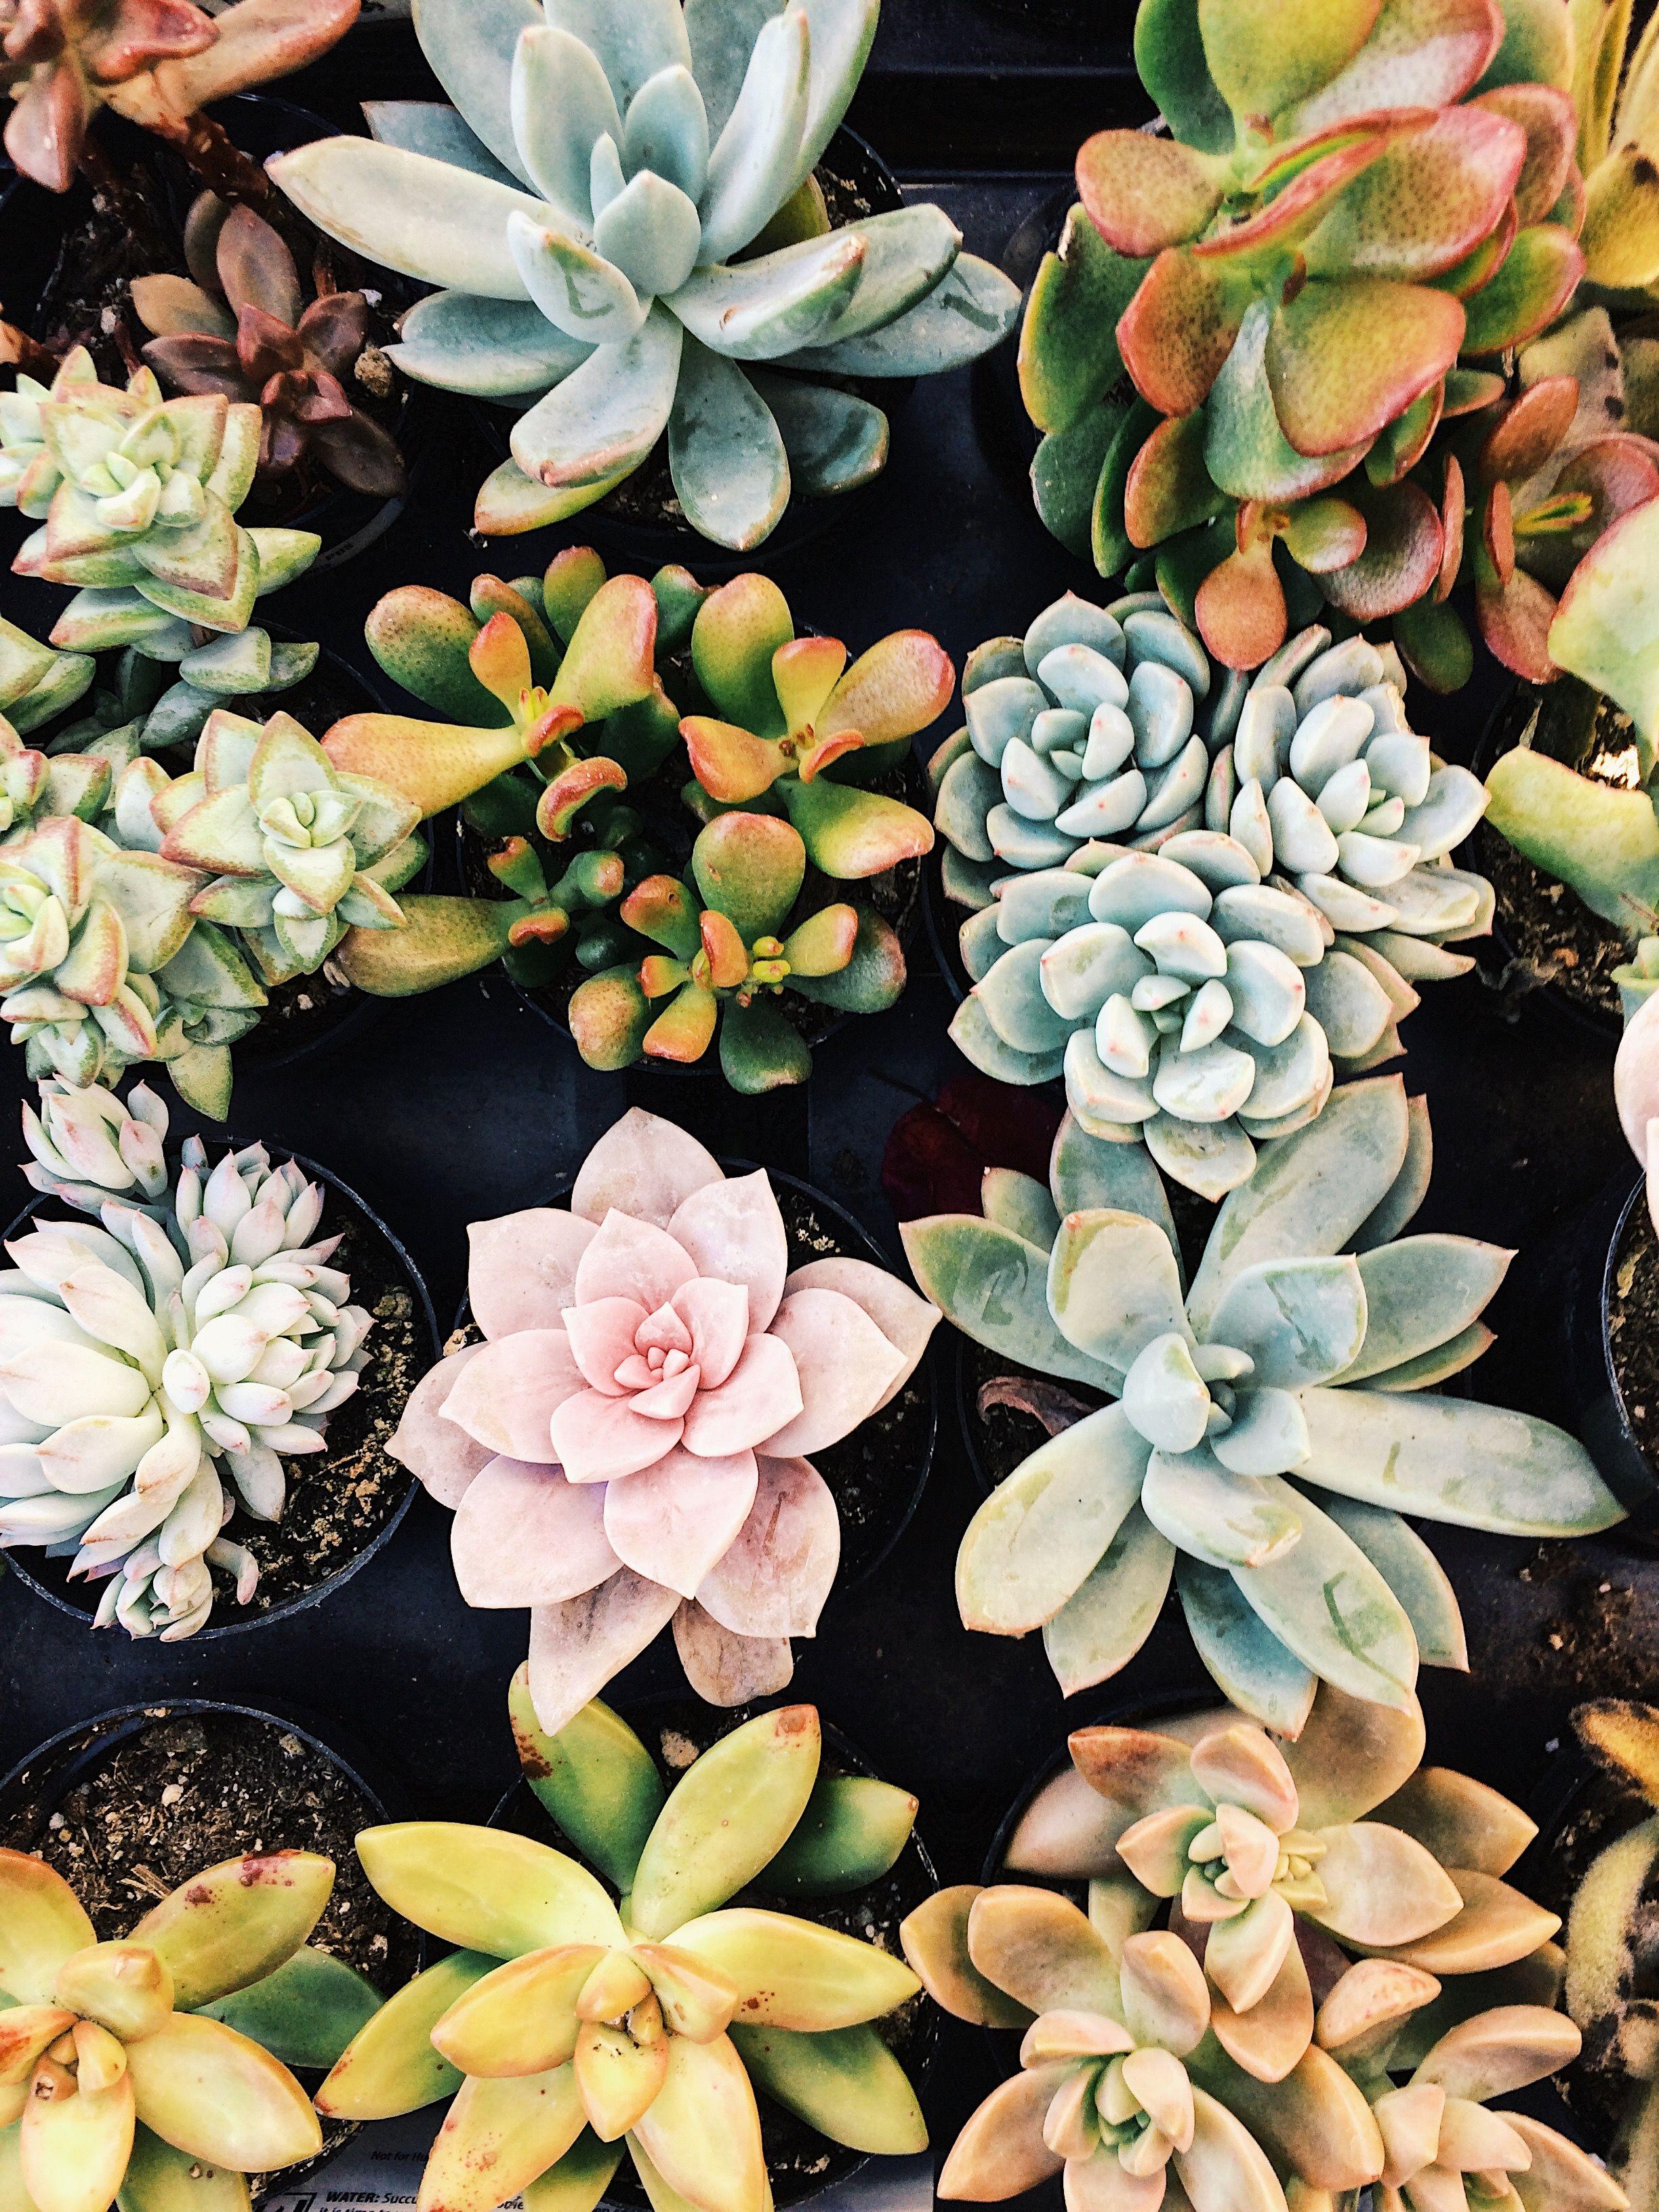 Home Depot Succulents Succulents Wallpaper Perfect Plants Plant Photography